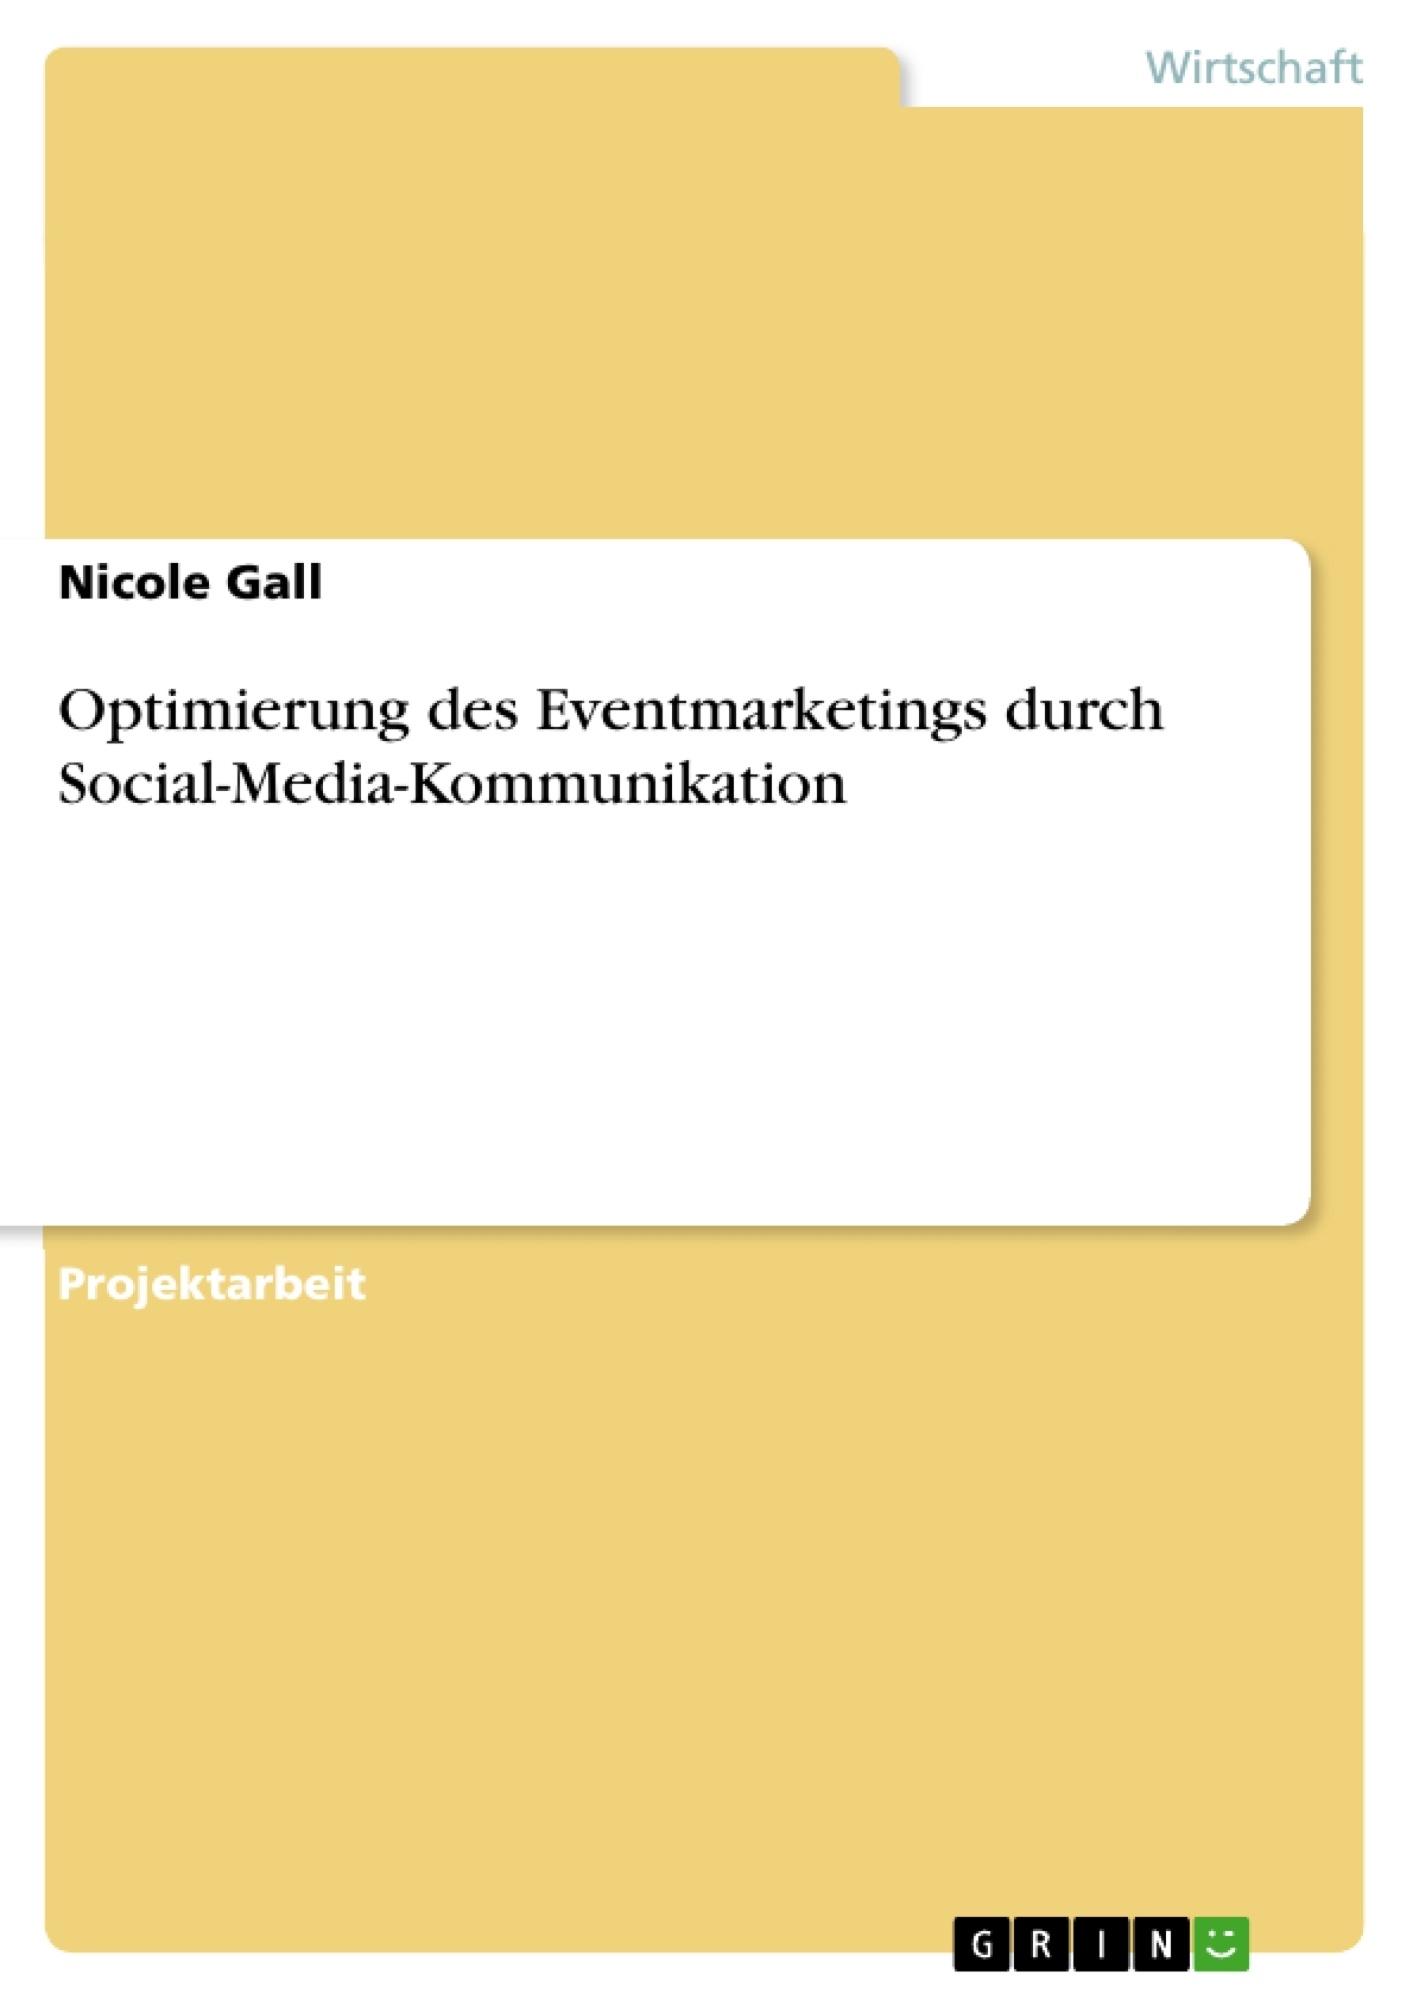 Titel: Optimierung des Eventmarketings durch Social-Media-Kommunikation